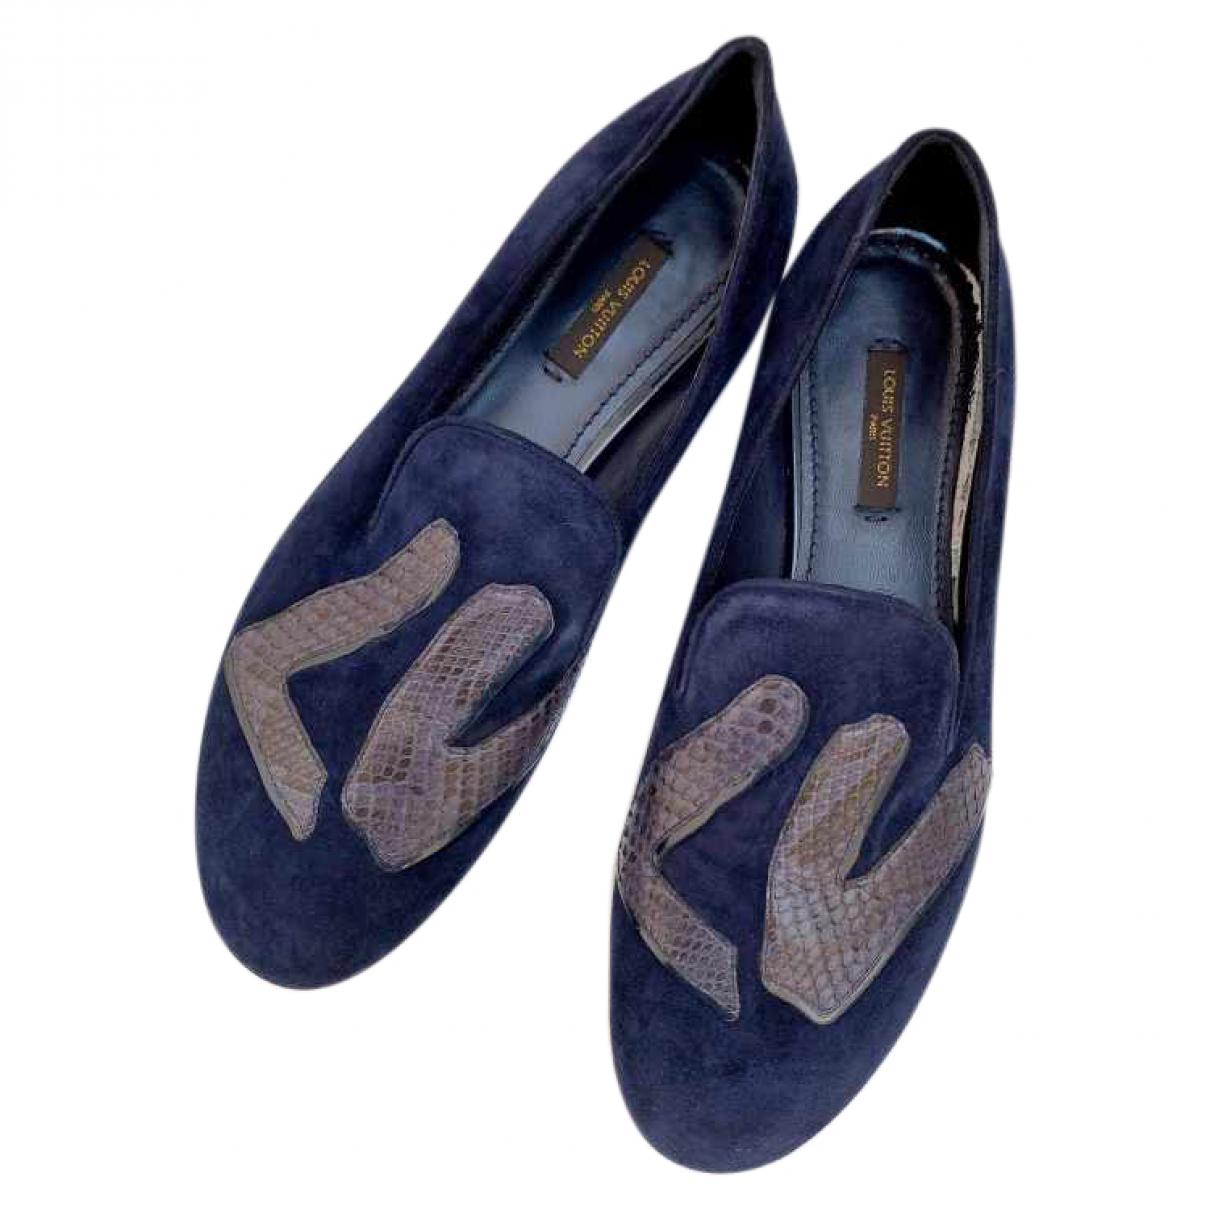 Louis Vuitton \N Espadrilles in  Blau Veloursleder